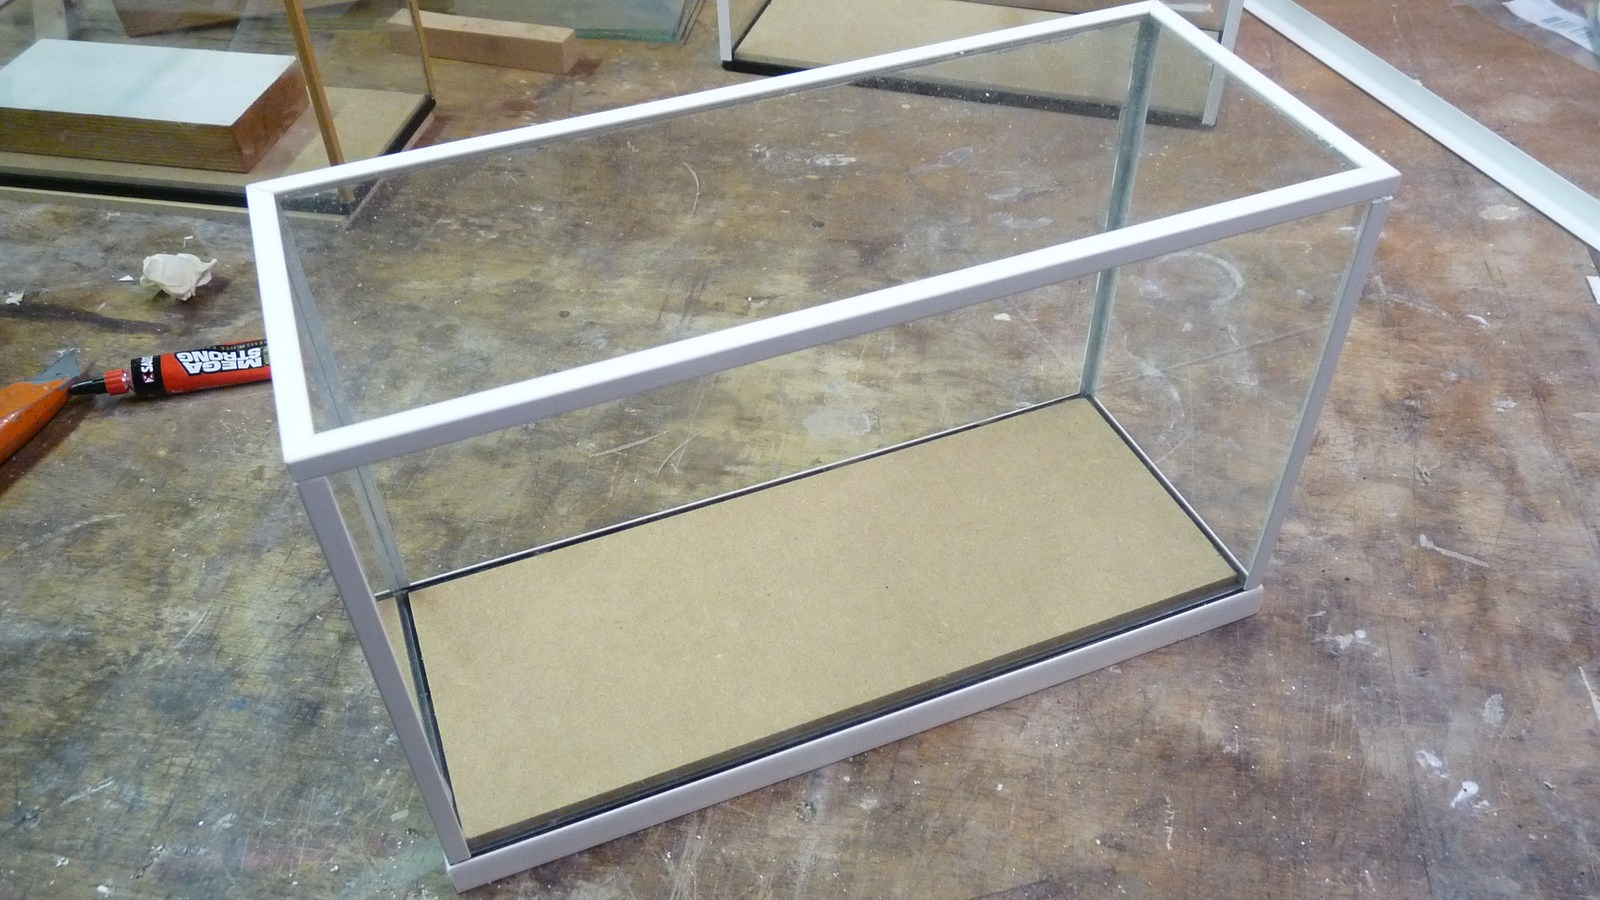 Fabriquer ses propres vitrines en verre 17071907271023134915156558